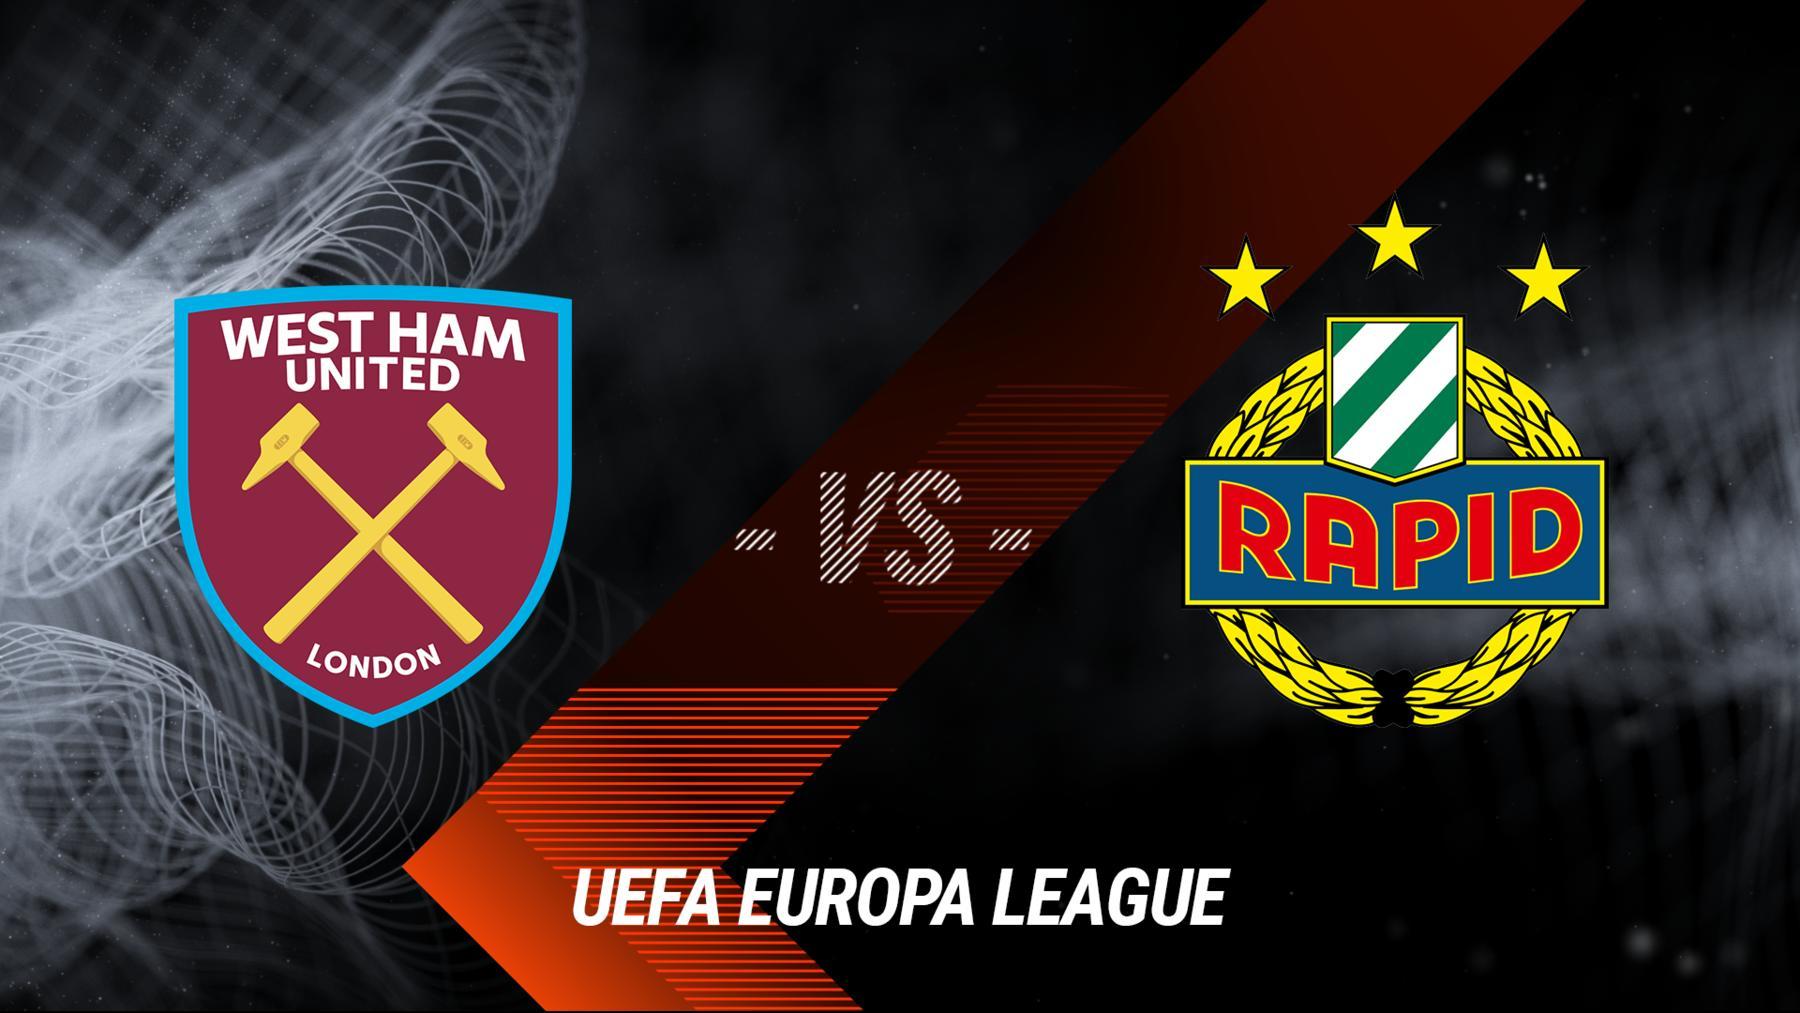 West Ham United - Rapid Wien